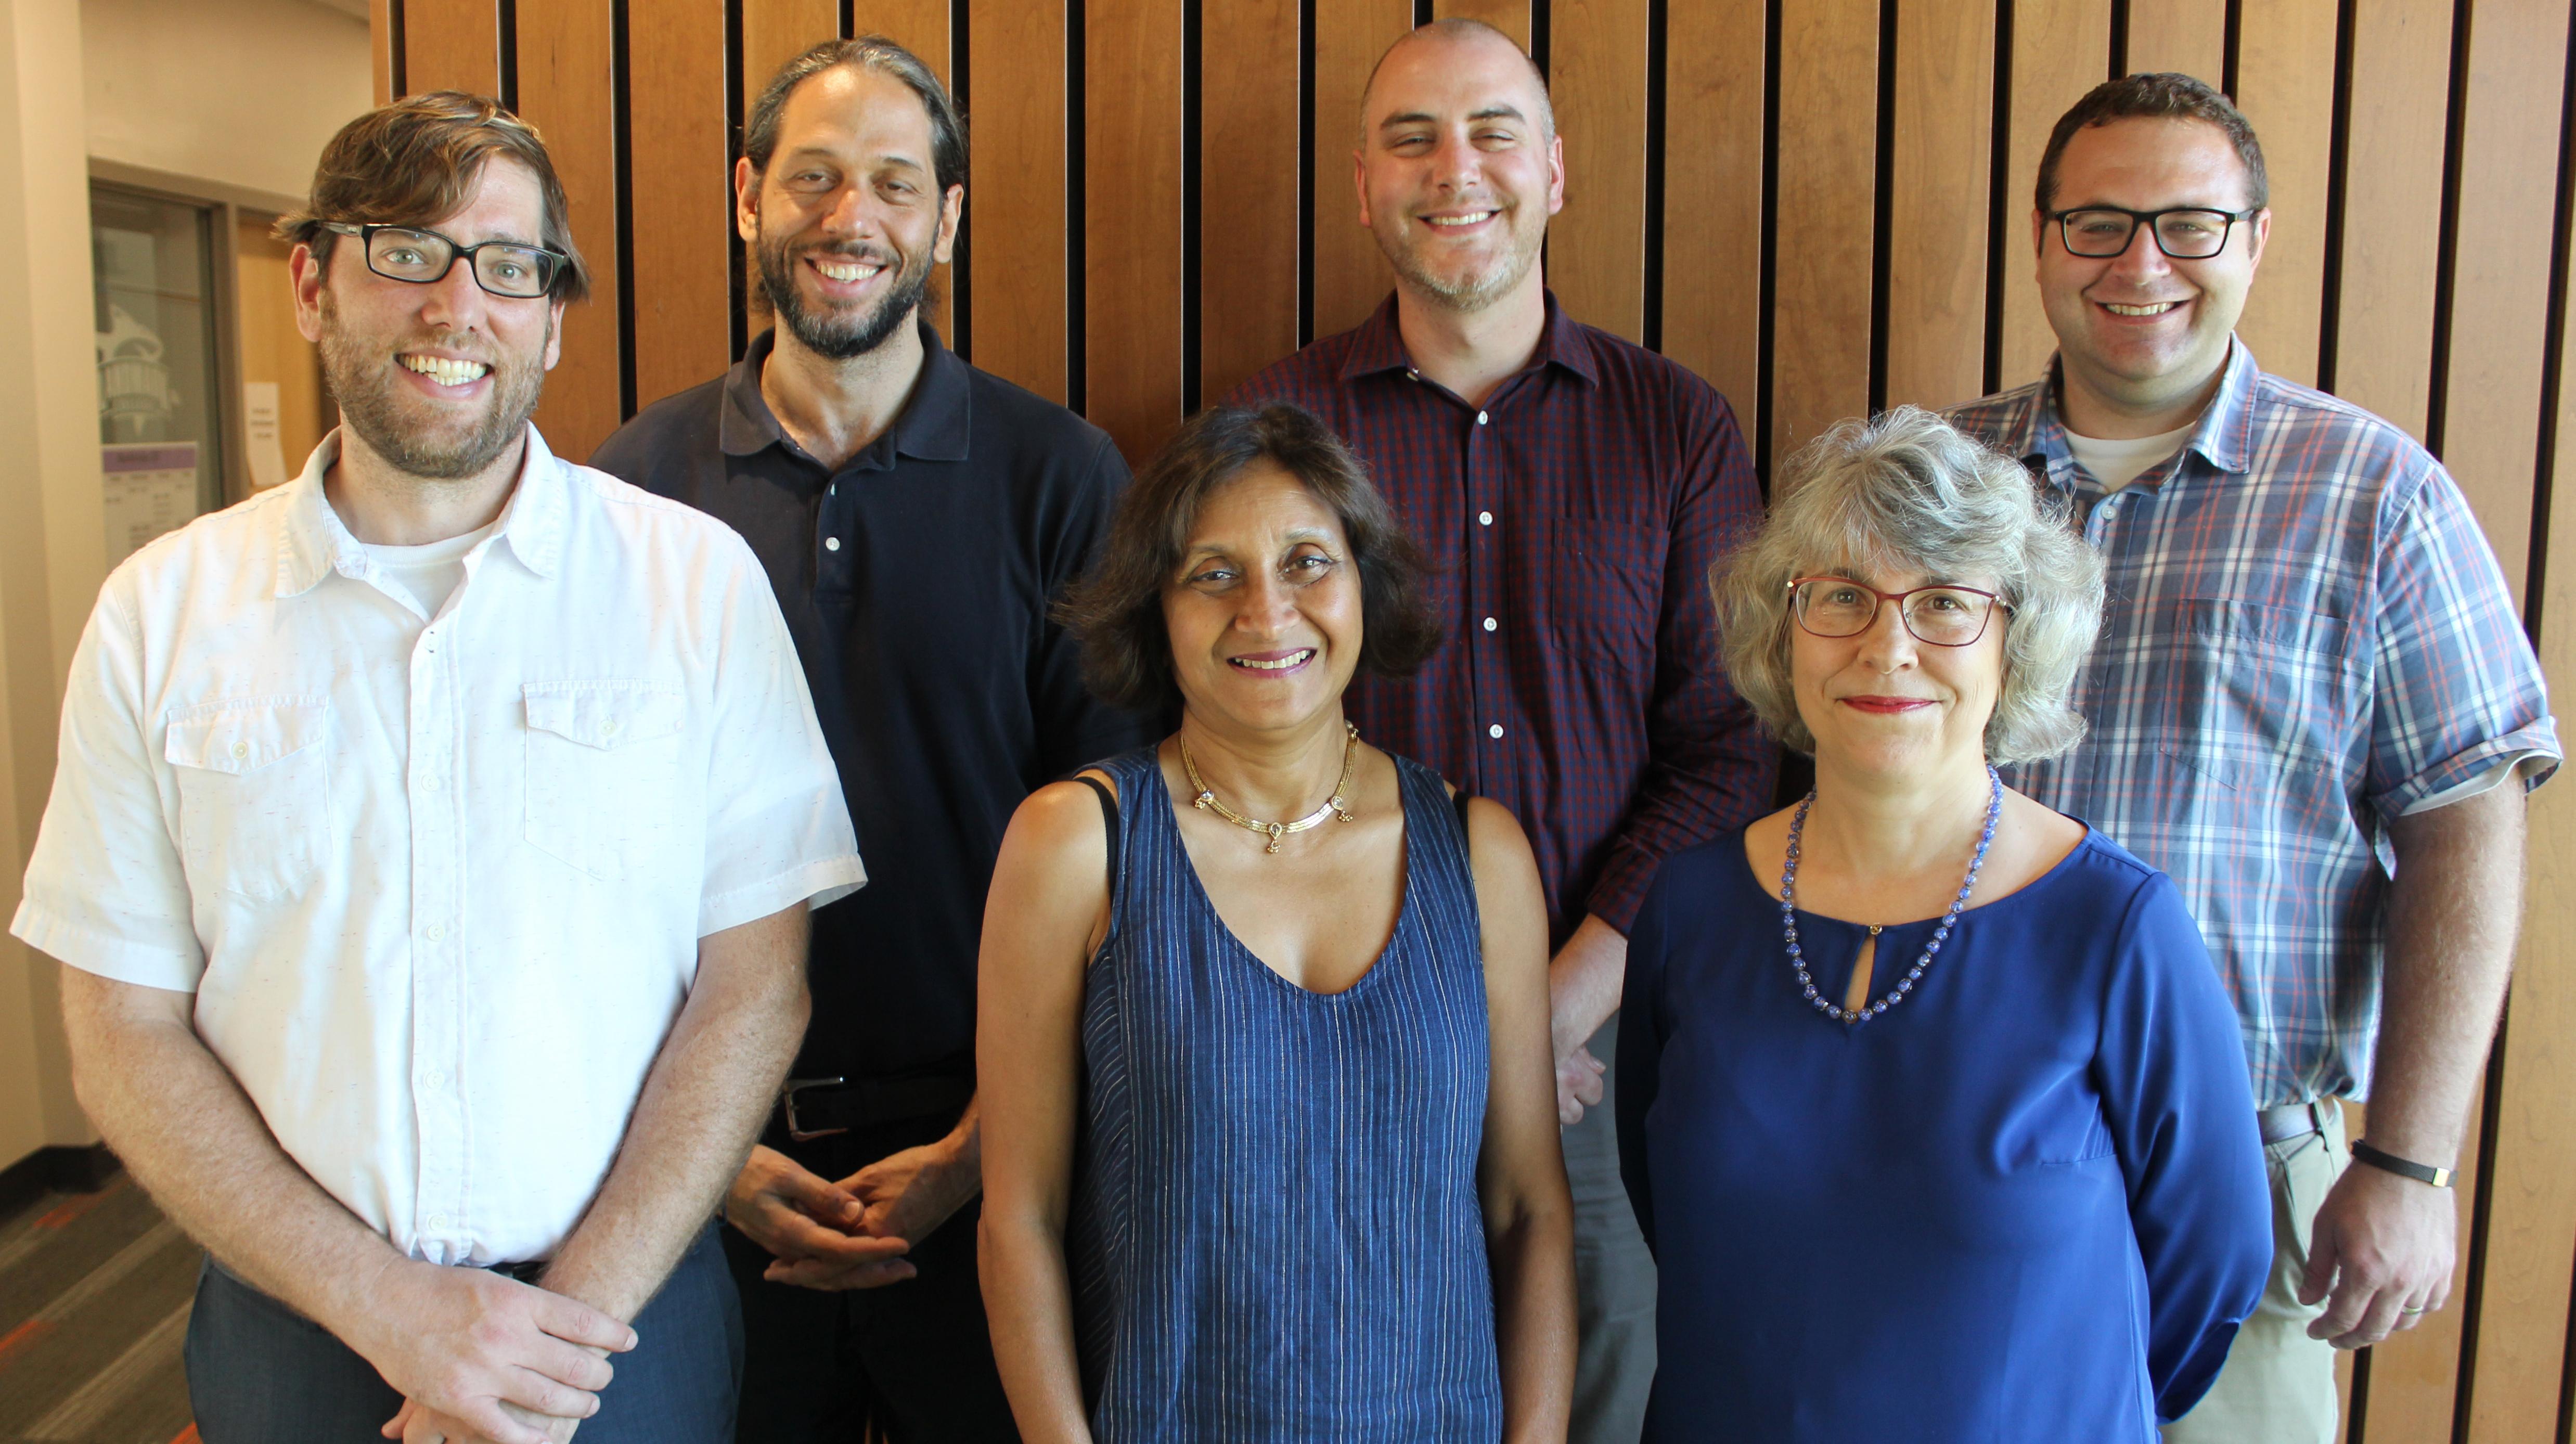 A photo of the LCIRT team (from left to right: Rick Bryck, Ibrahim Dahlstrom-Hakki, Manju Banerjee, Christopher Wenz, Carol Beninati, Adam Lalor)